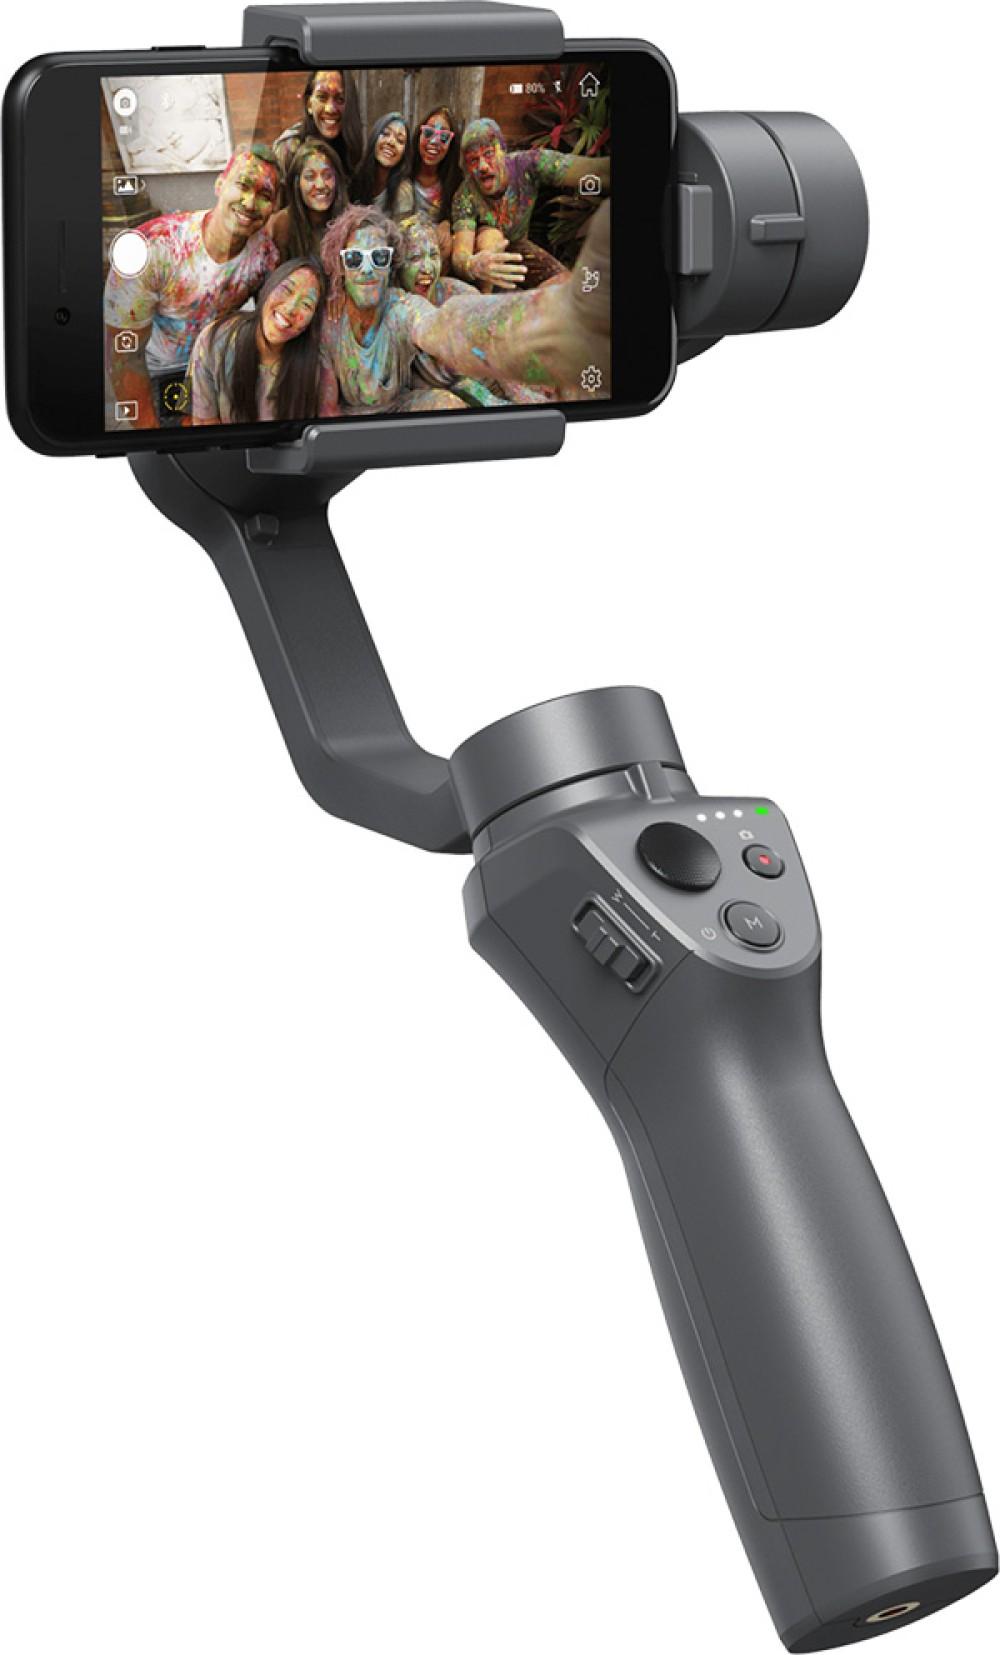 DJI Osmo Mobile 2: Το νέο smartphone stabilizer της εταιρείας [CES 2018]